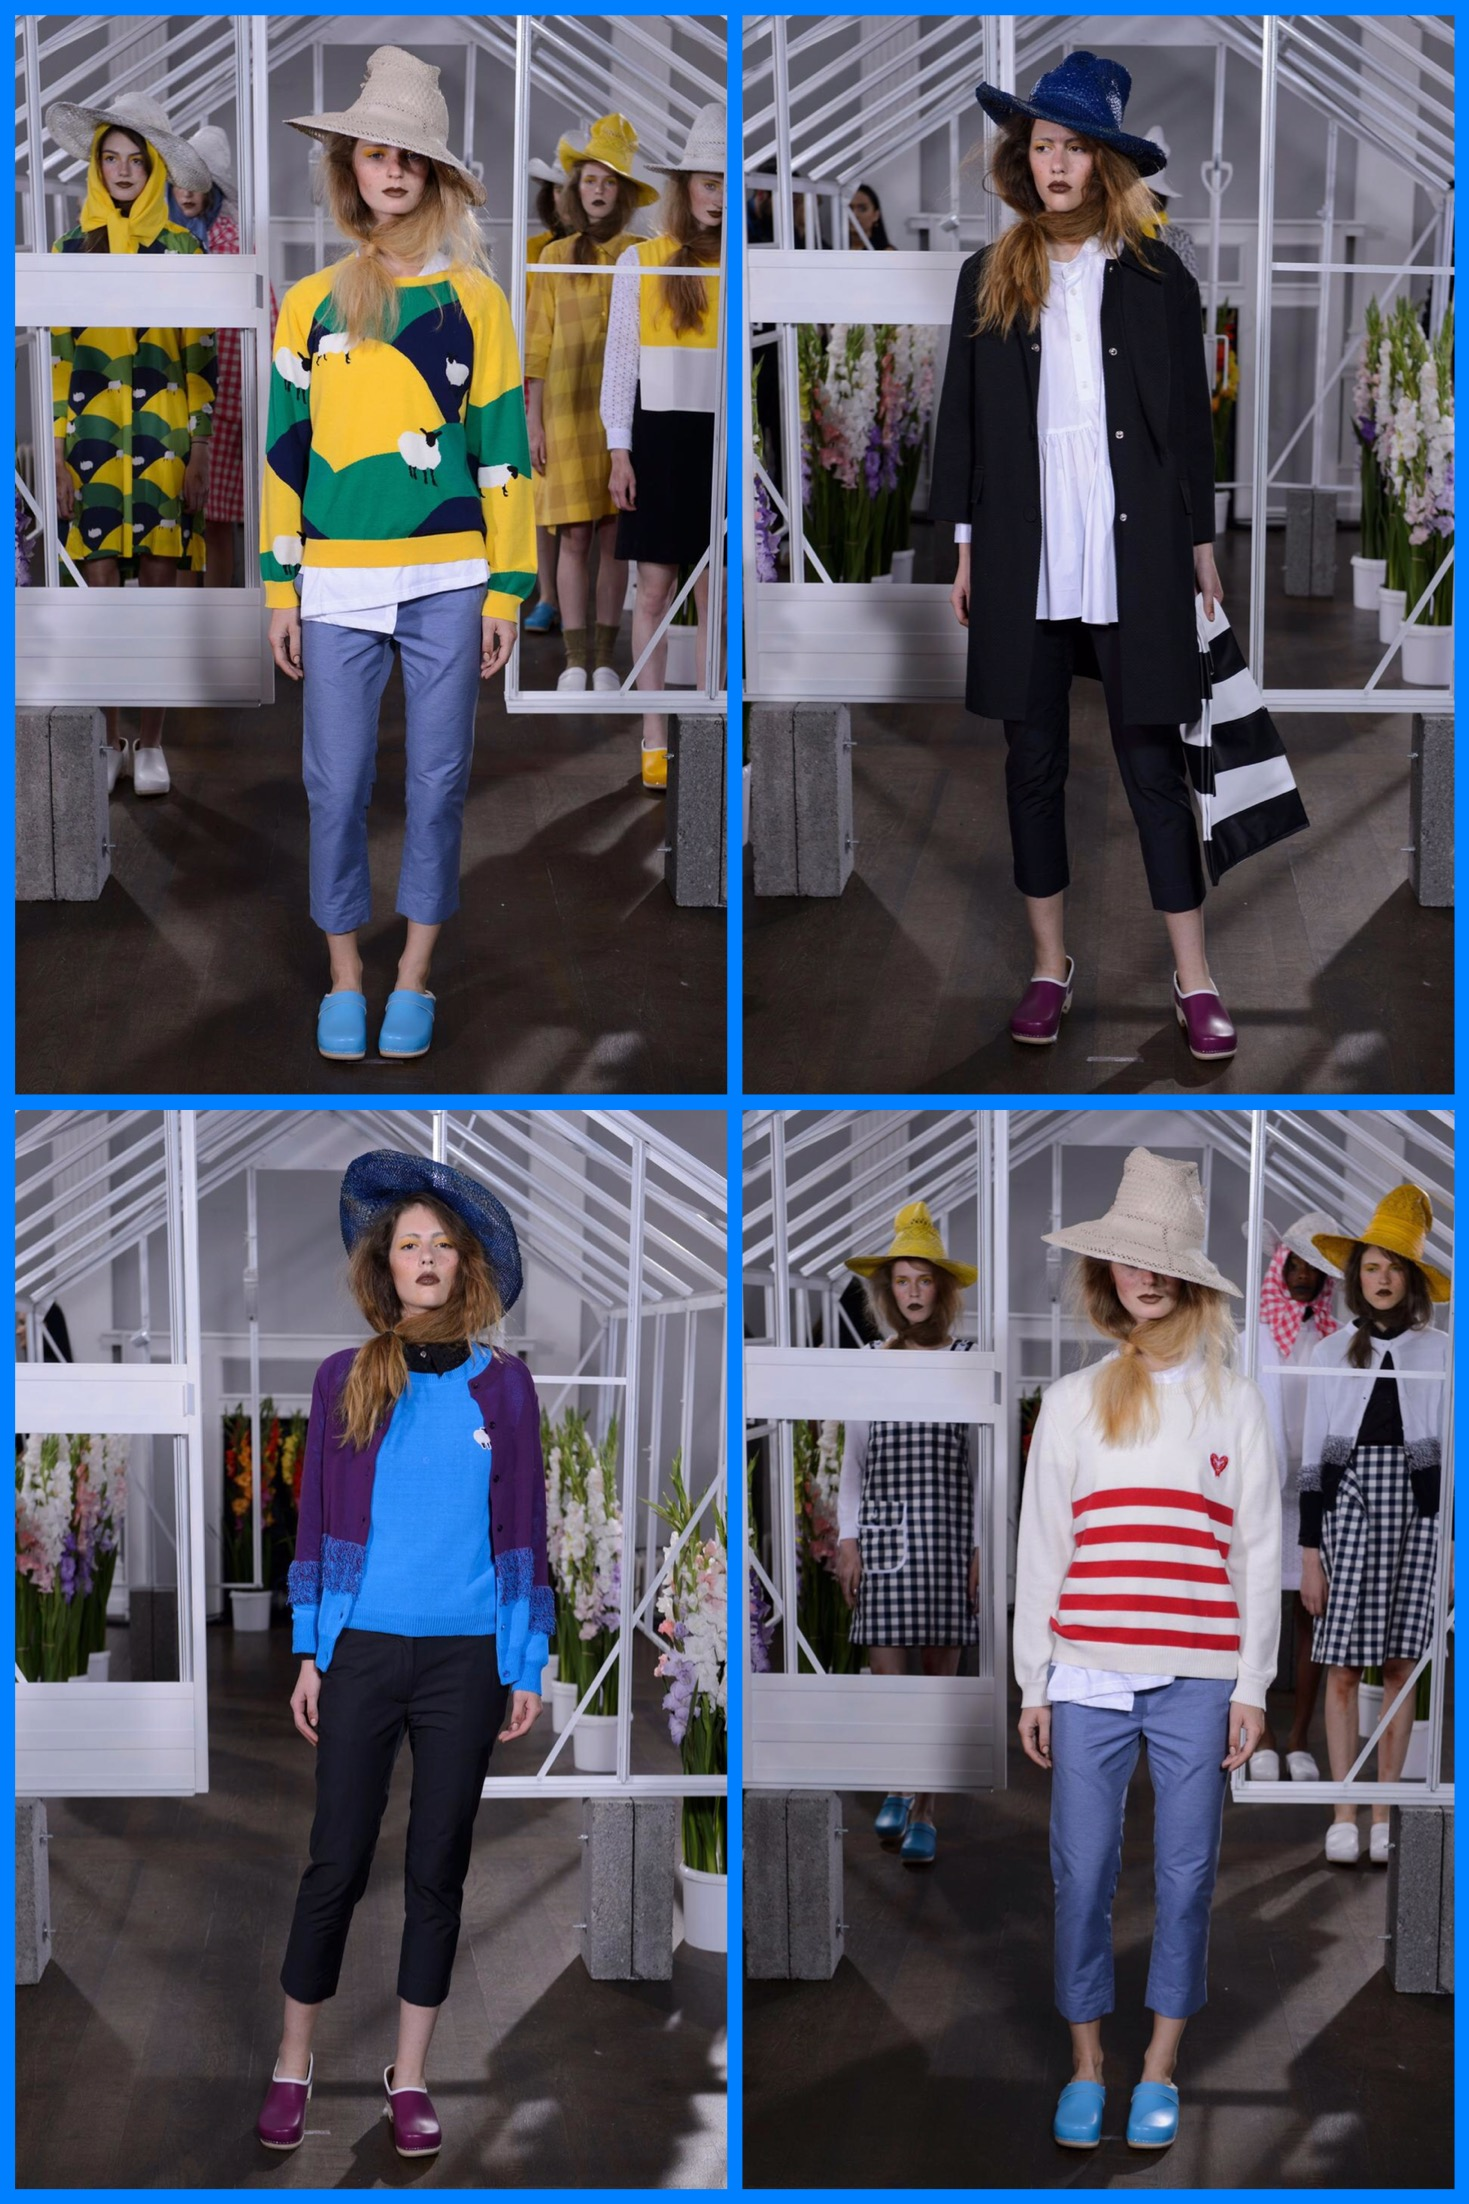 london-fashion-week-pret-a-porter-spring-summer-2017-style-peter-jensen